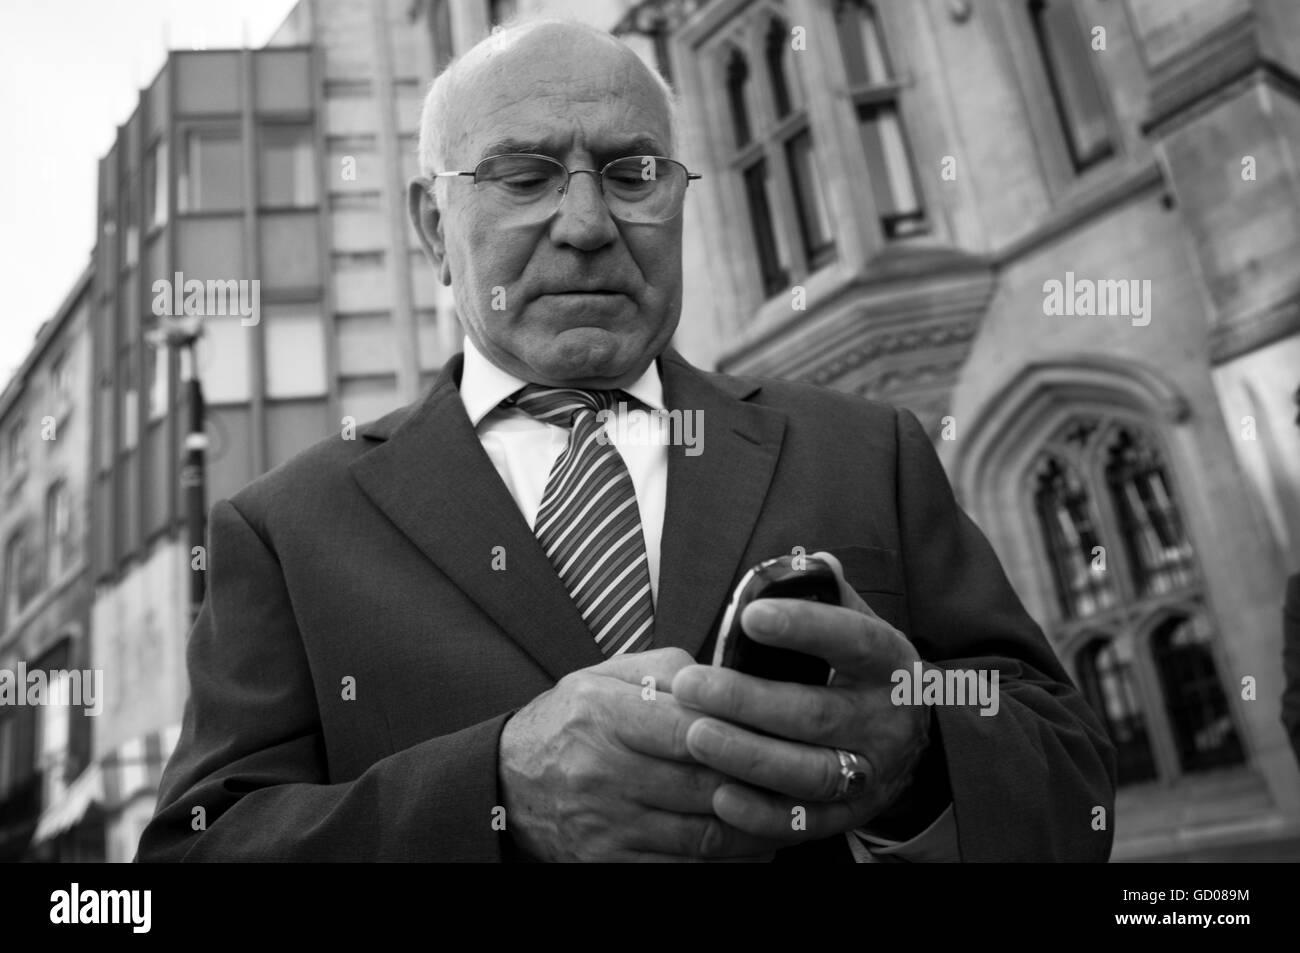 Oder gentleman using his mobile phone - Stock Image